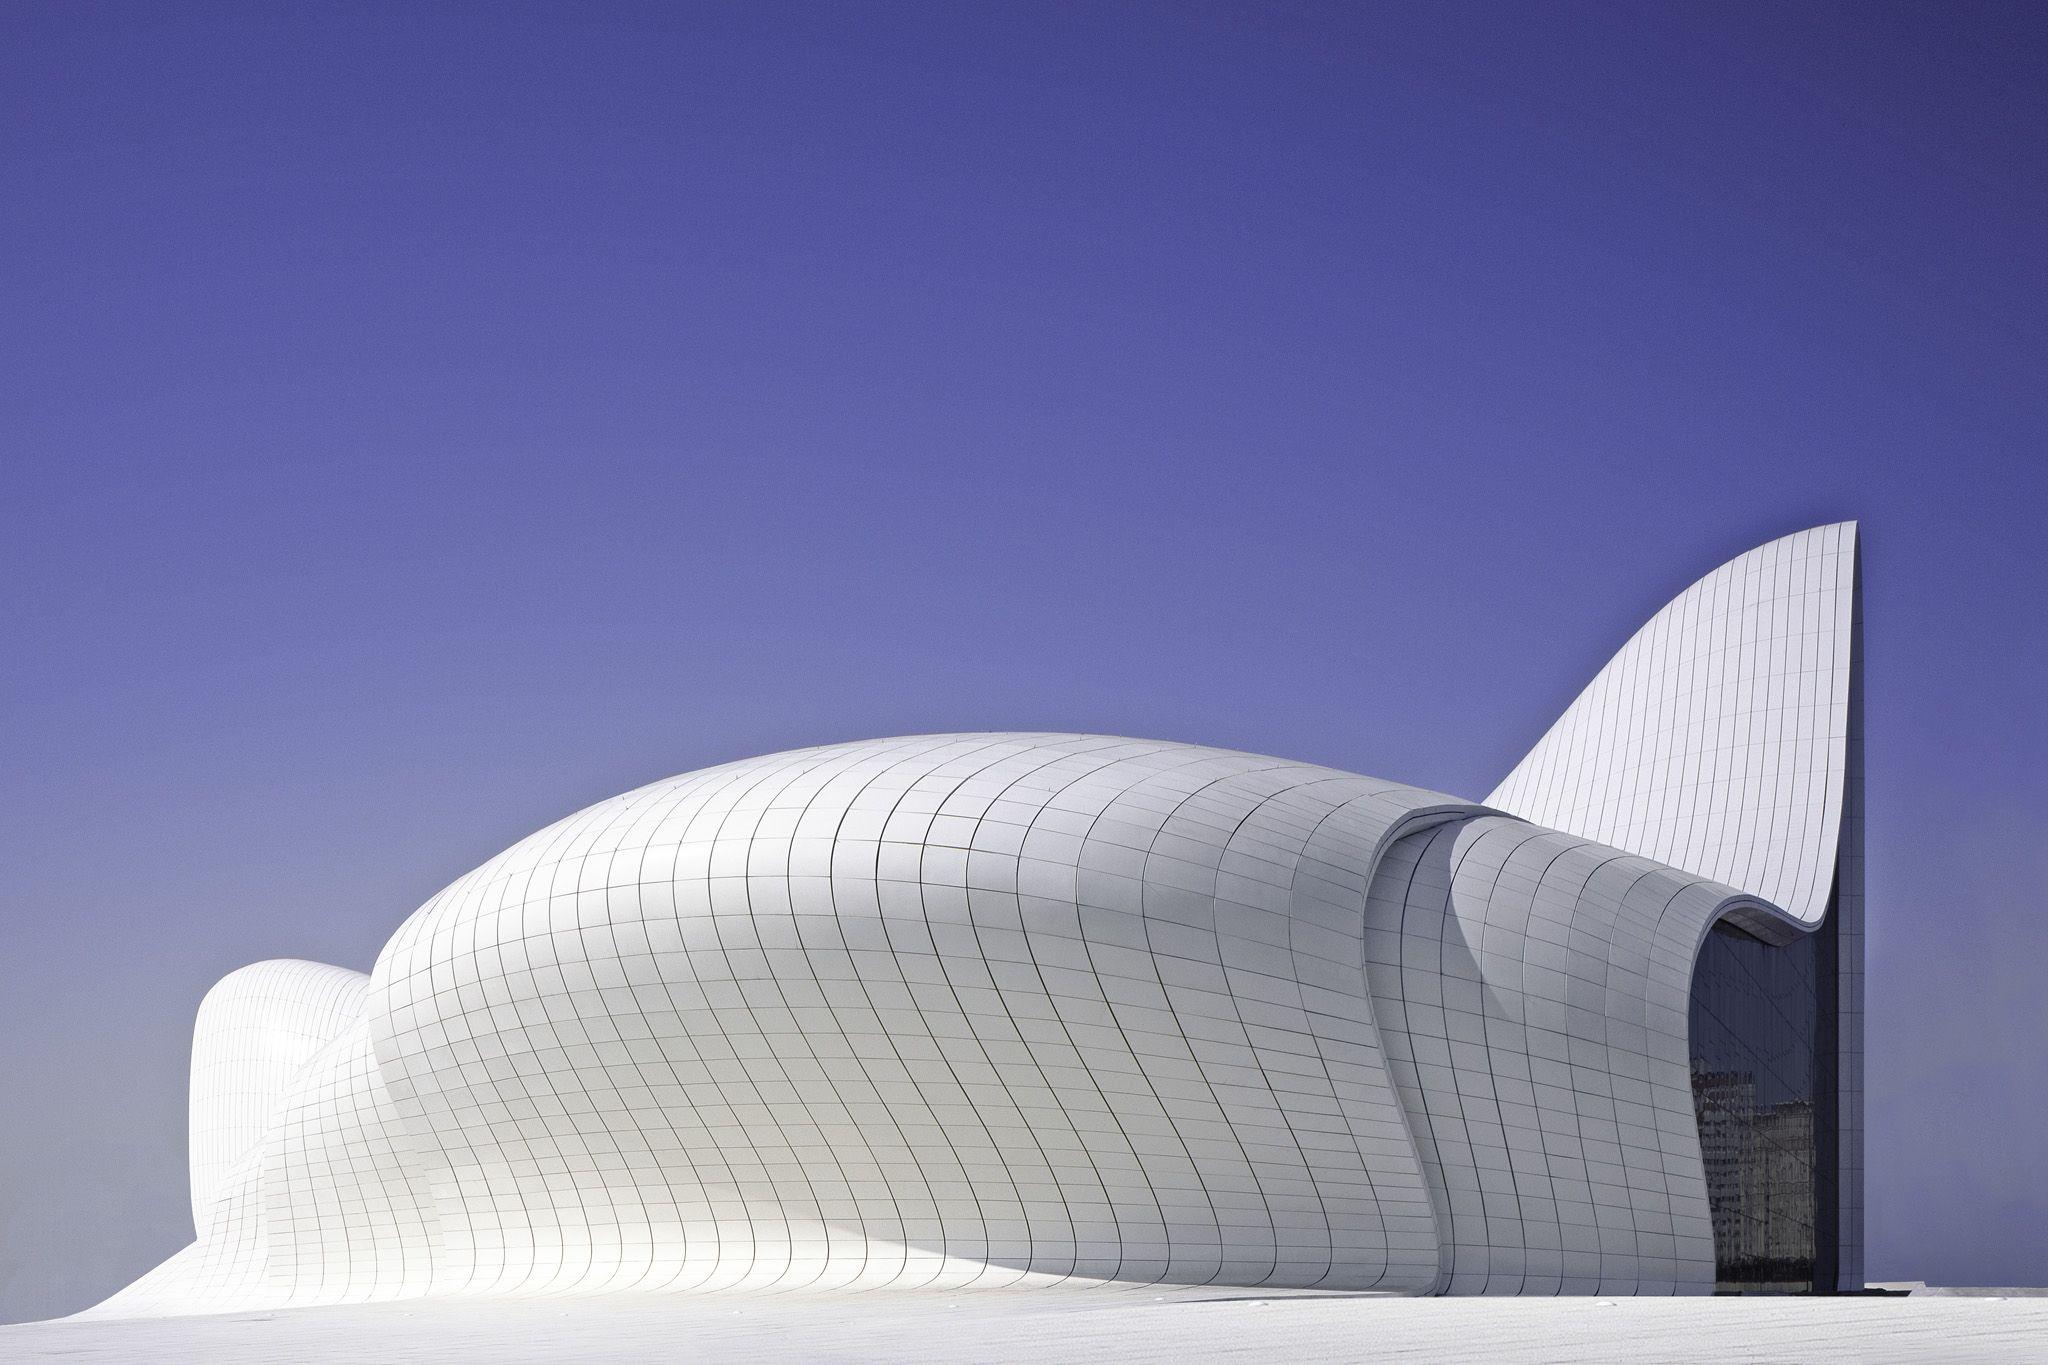 Heydar Aliyev Center Zaha Hadid Architects Zaha Hadid Zaha Zaha Hadid Architects